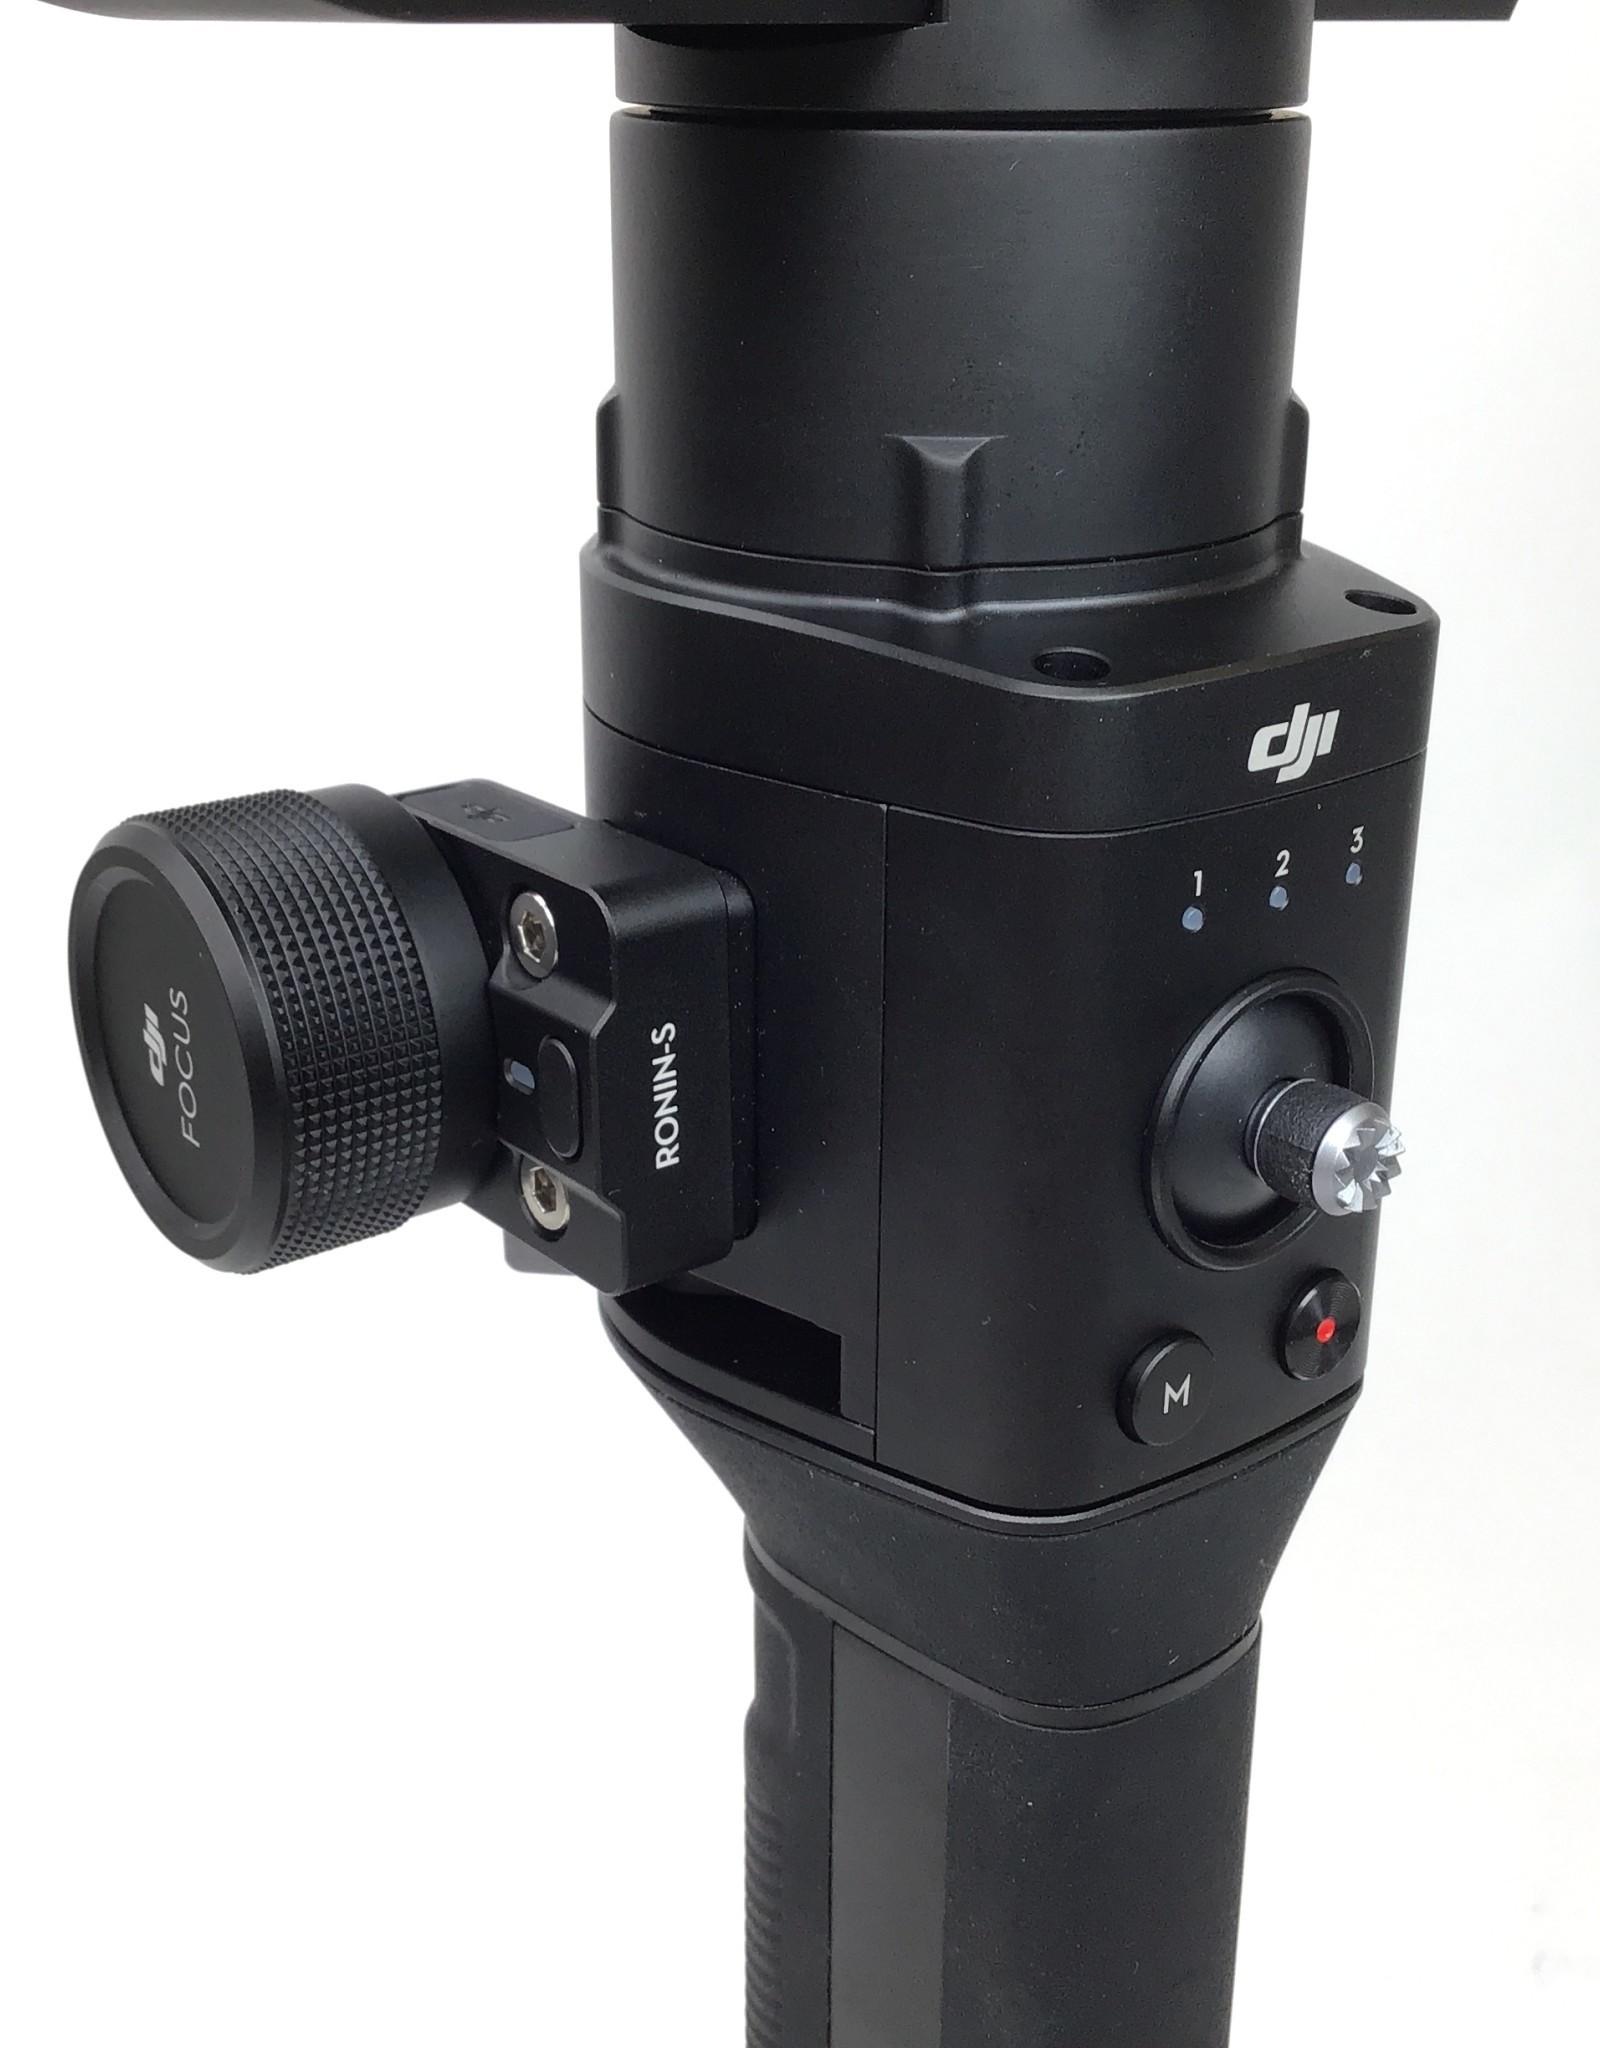 DJI DJI Ronis S Camera Stabilizer in Case Used EX